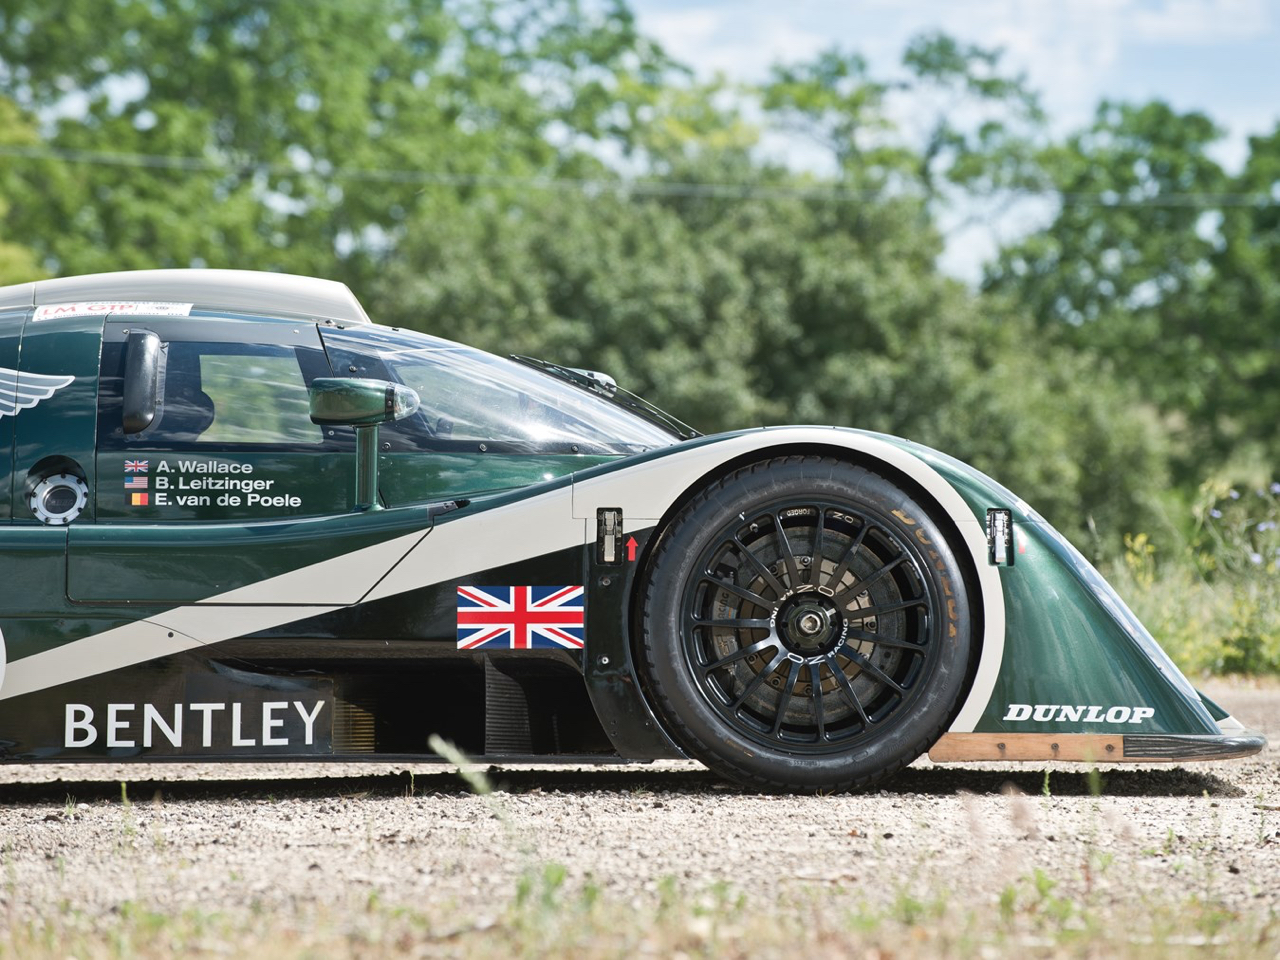 Engine Sound : Bentley Speed 8 - 3 années pour 1 victoire ! 6